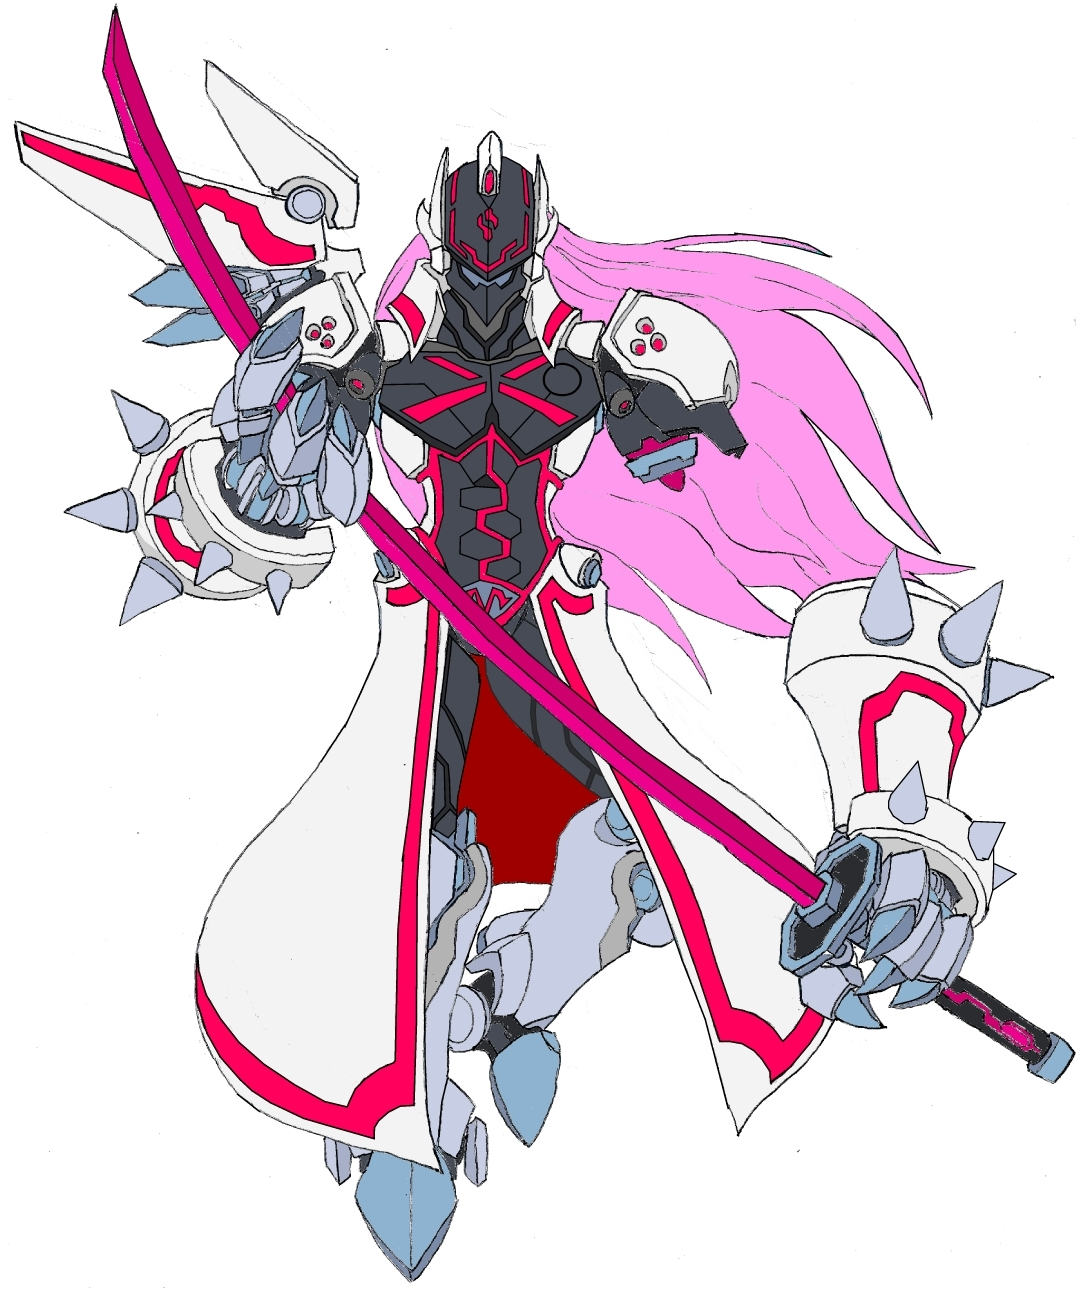 Omega Zero Sephiroth by Tyrranux on DeviantArt